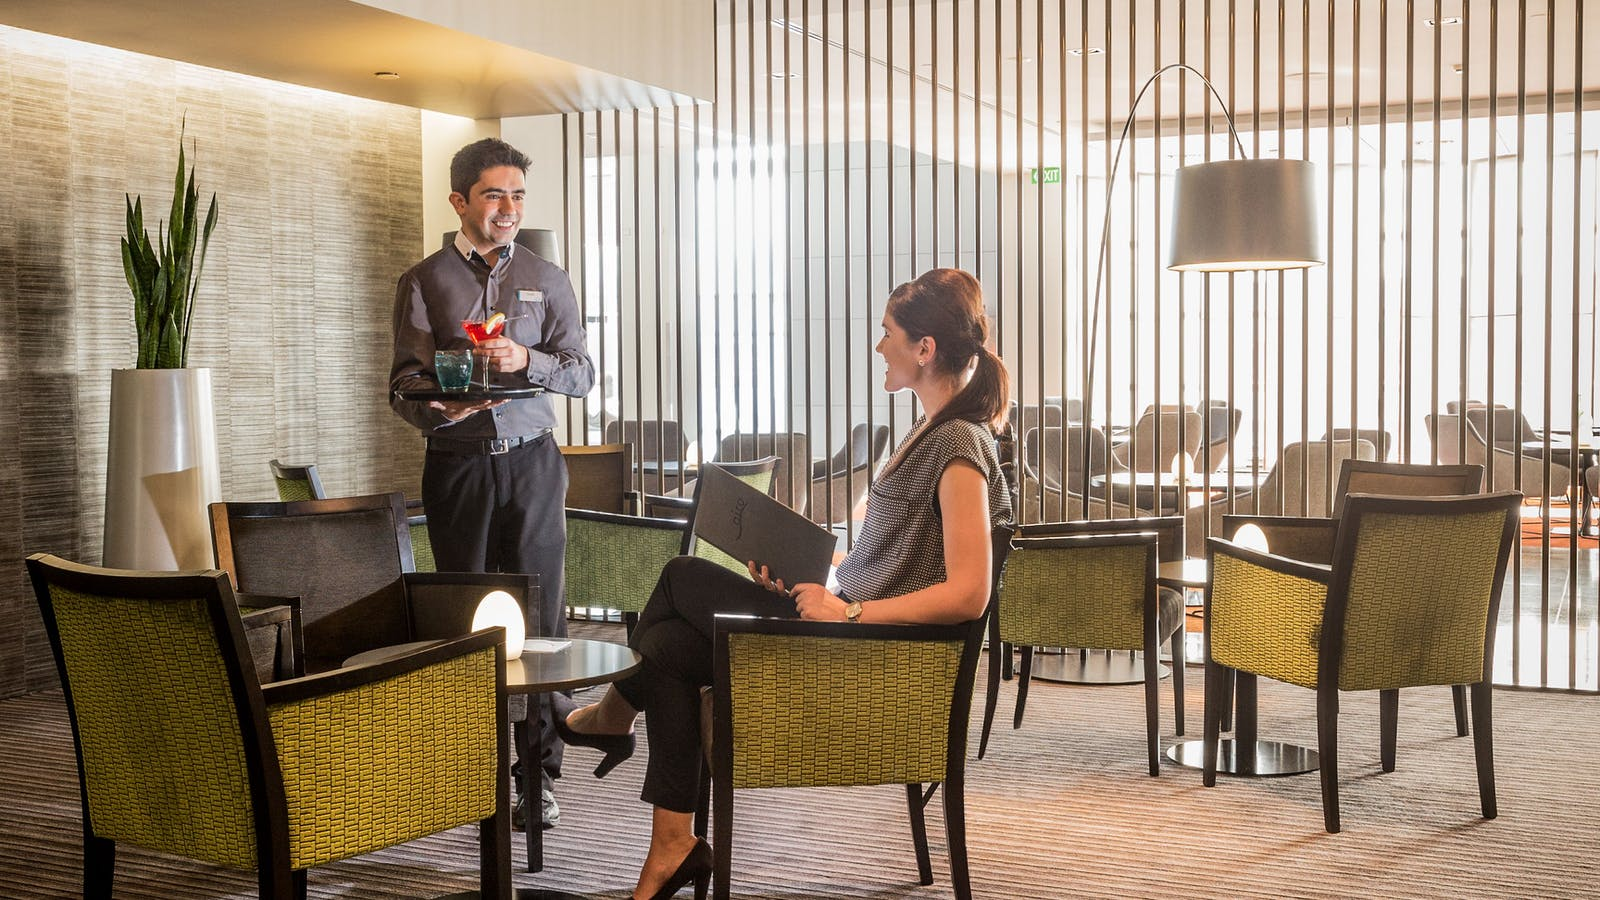 AIRO Restaurant & Bar